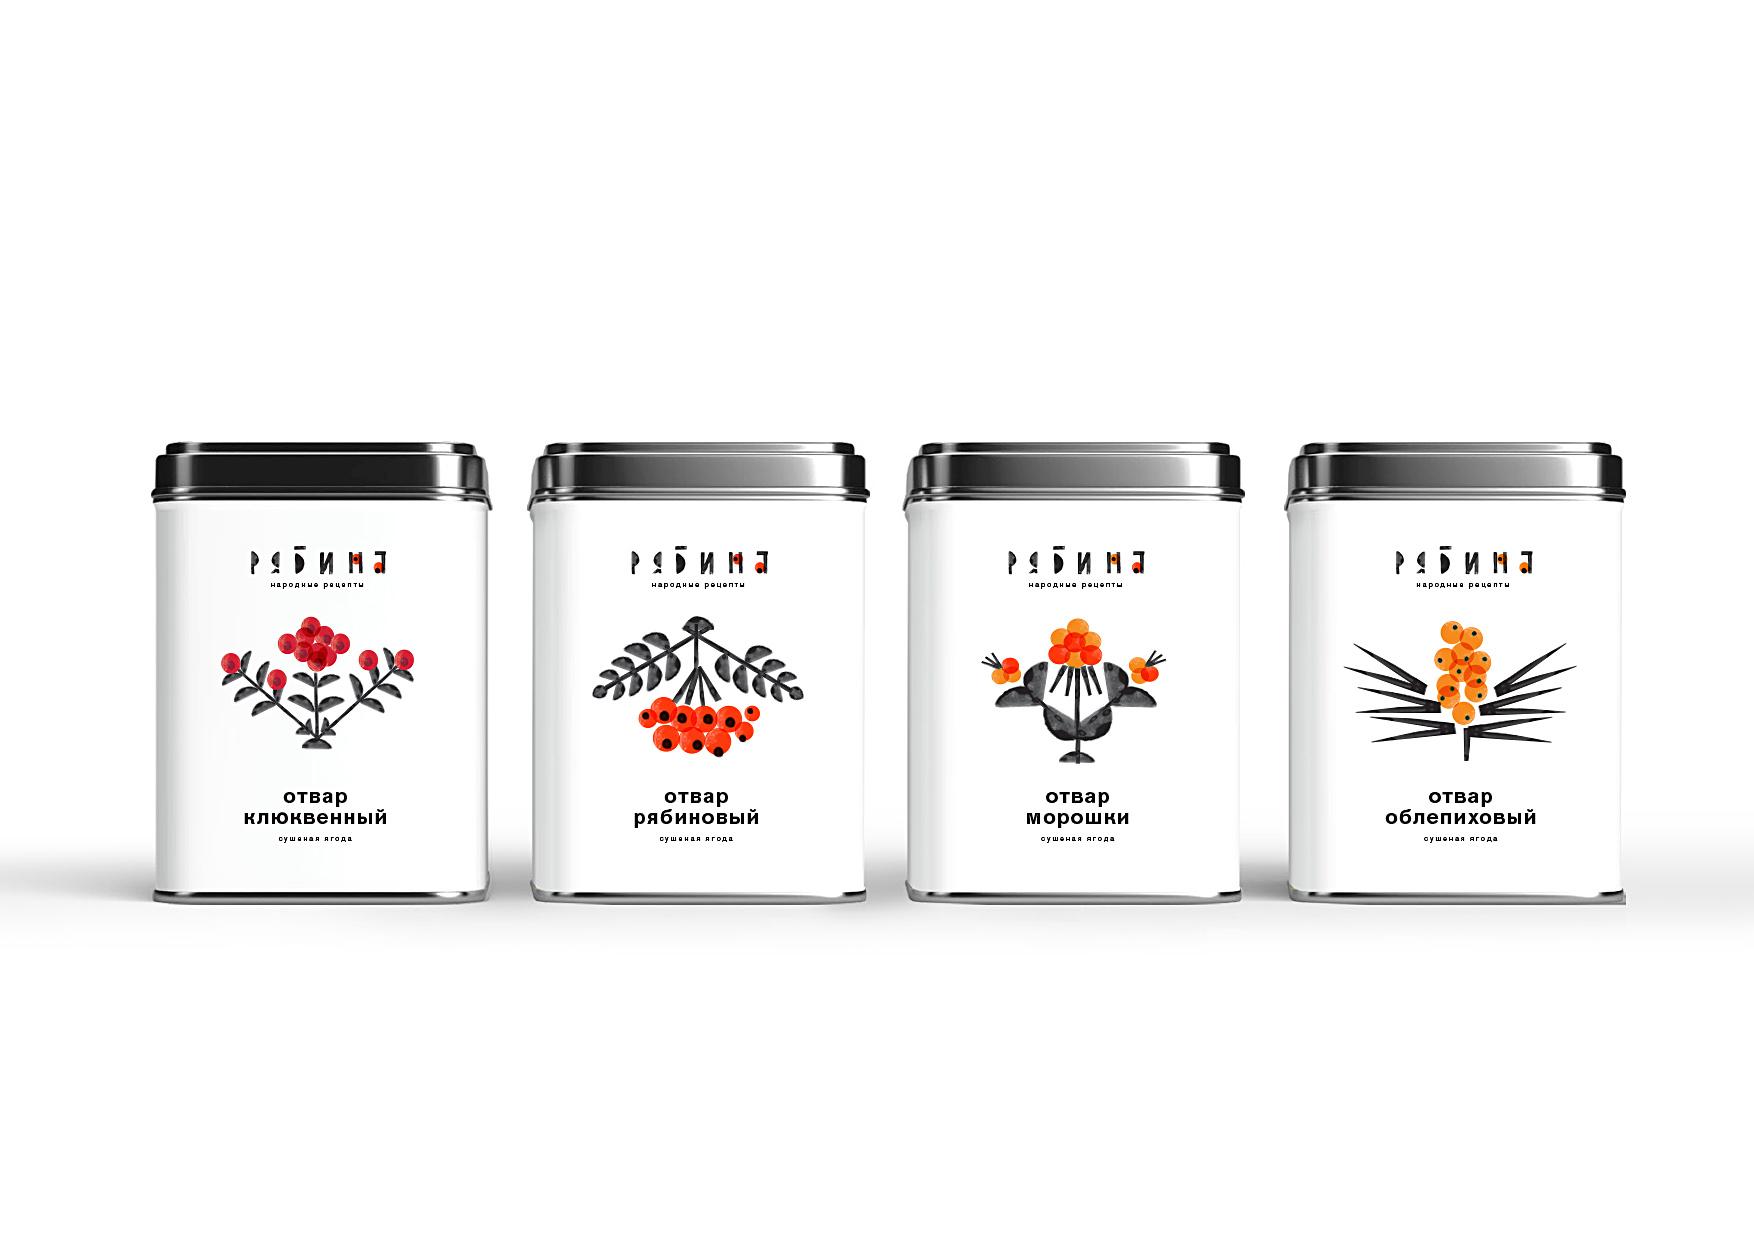 Ryabina Herbal Tea and Beverages Experimental Packaging Design Concept by Student Tatiana Dunaeva